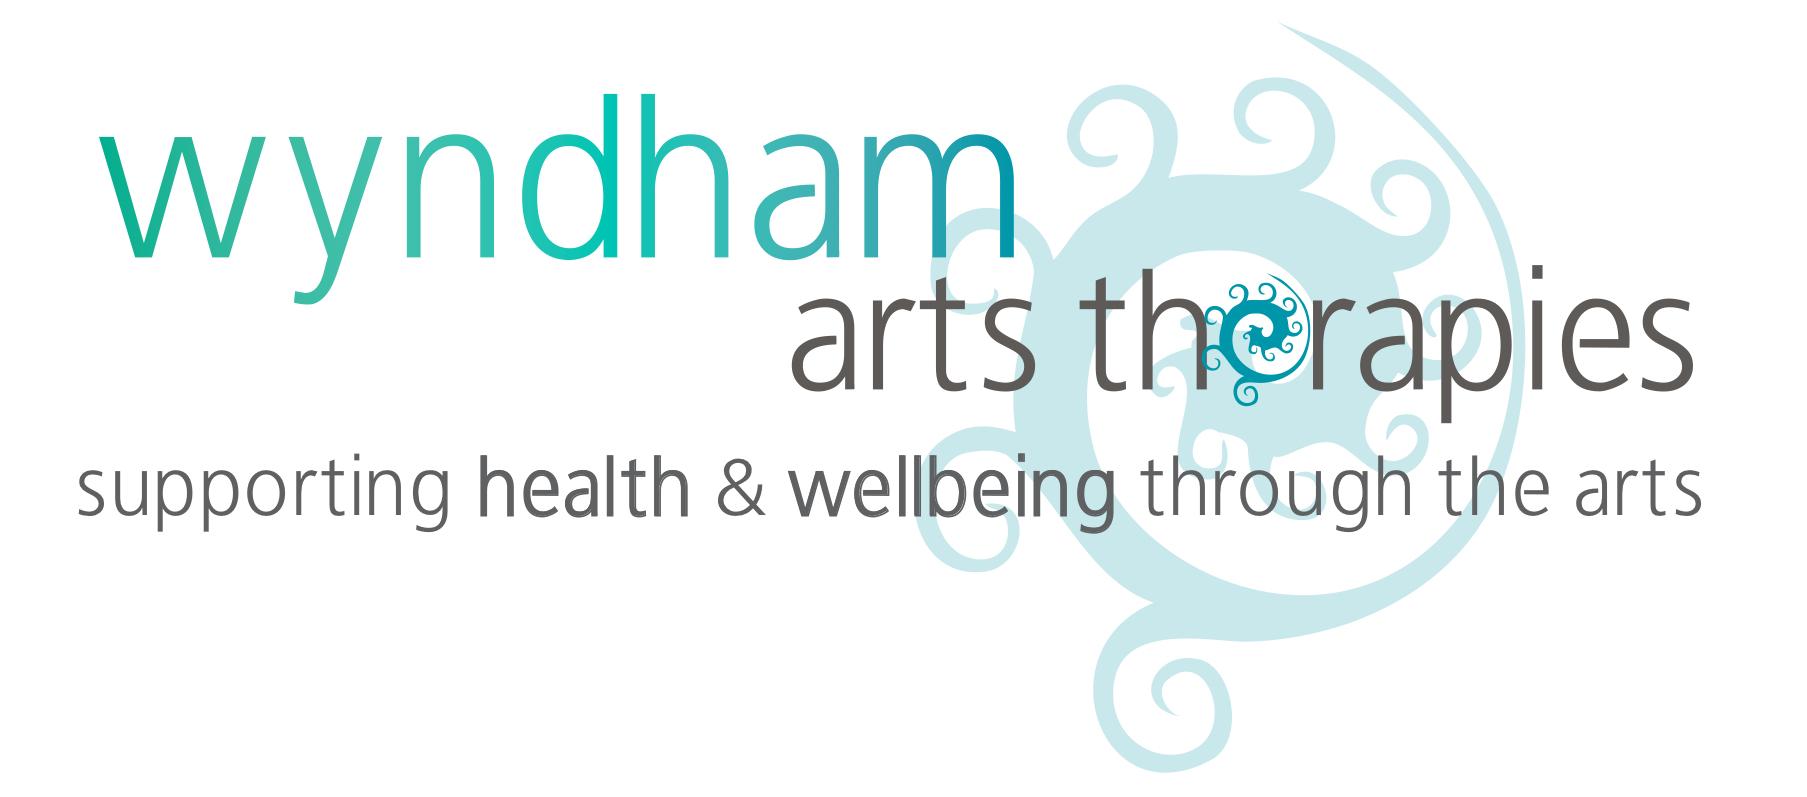 Wyndham Arts Therapies